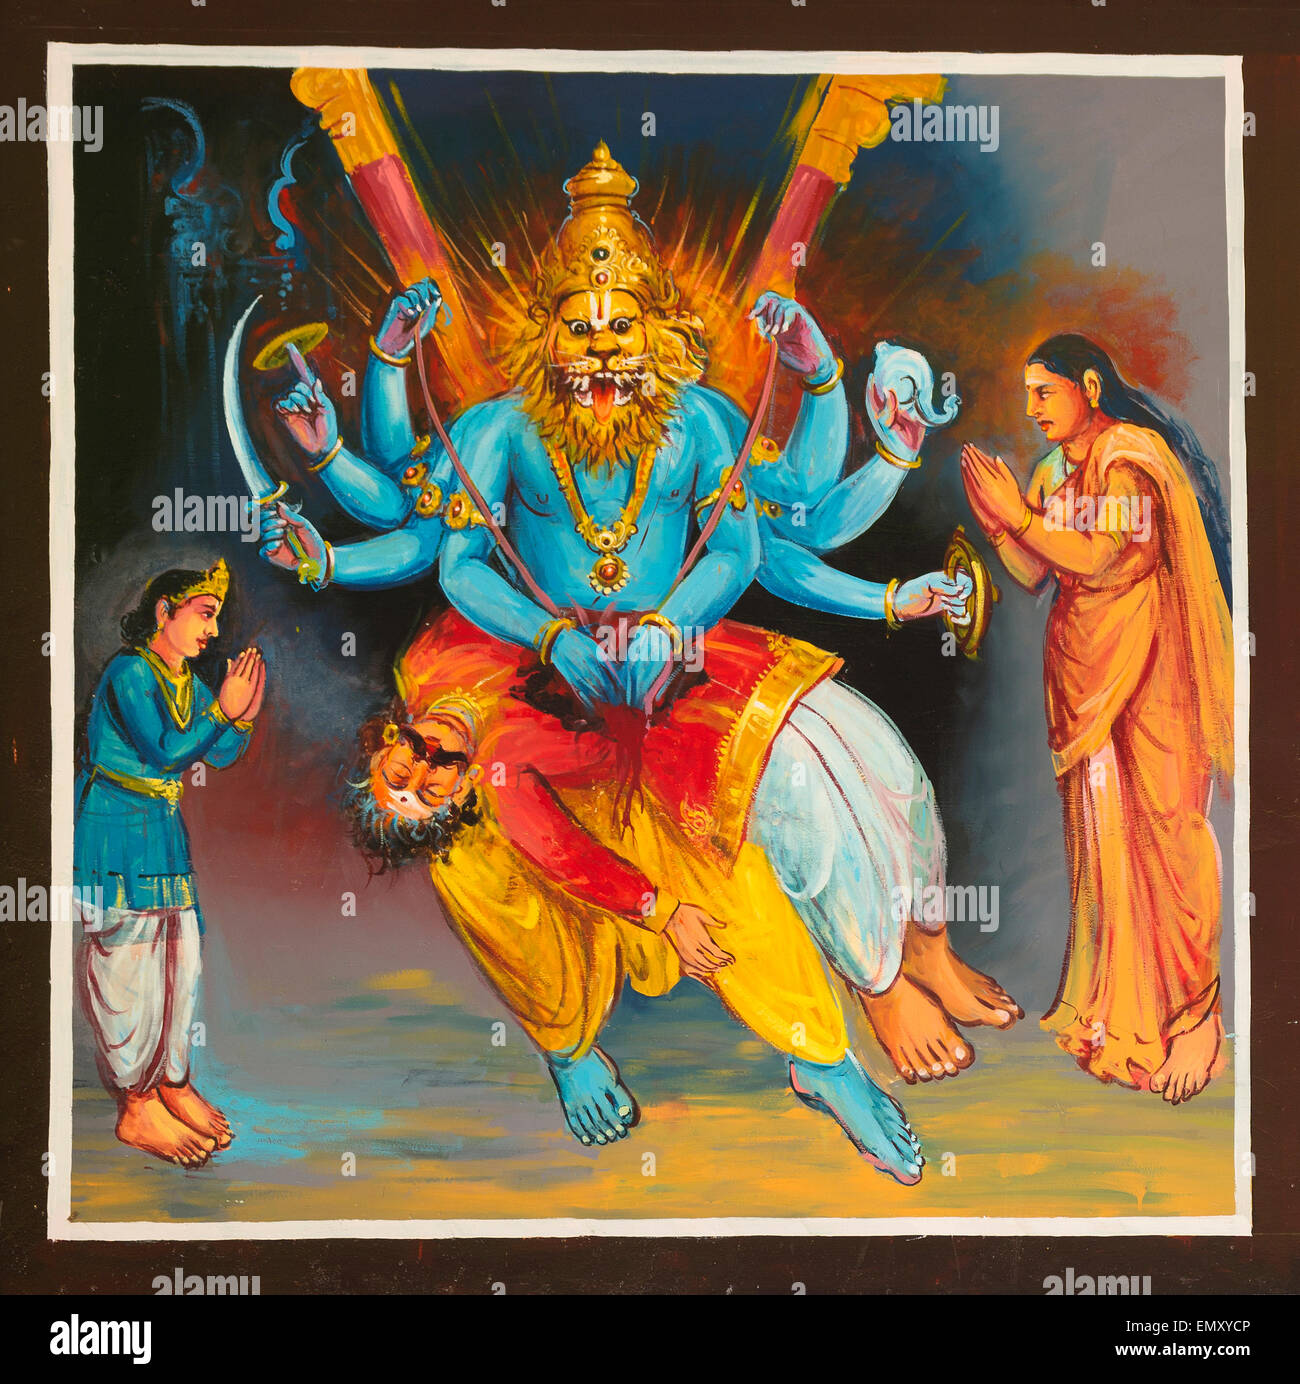 Lord Narasimha Stock Photos & Lord Narasimha Stock Images